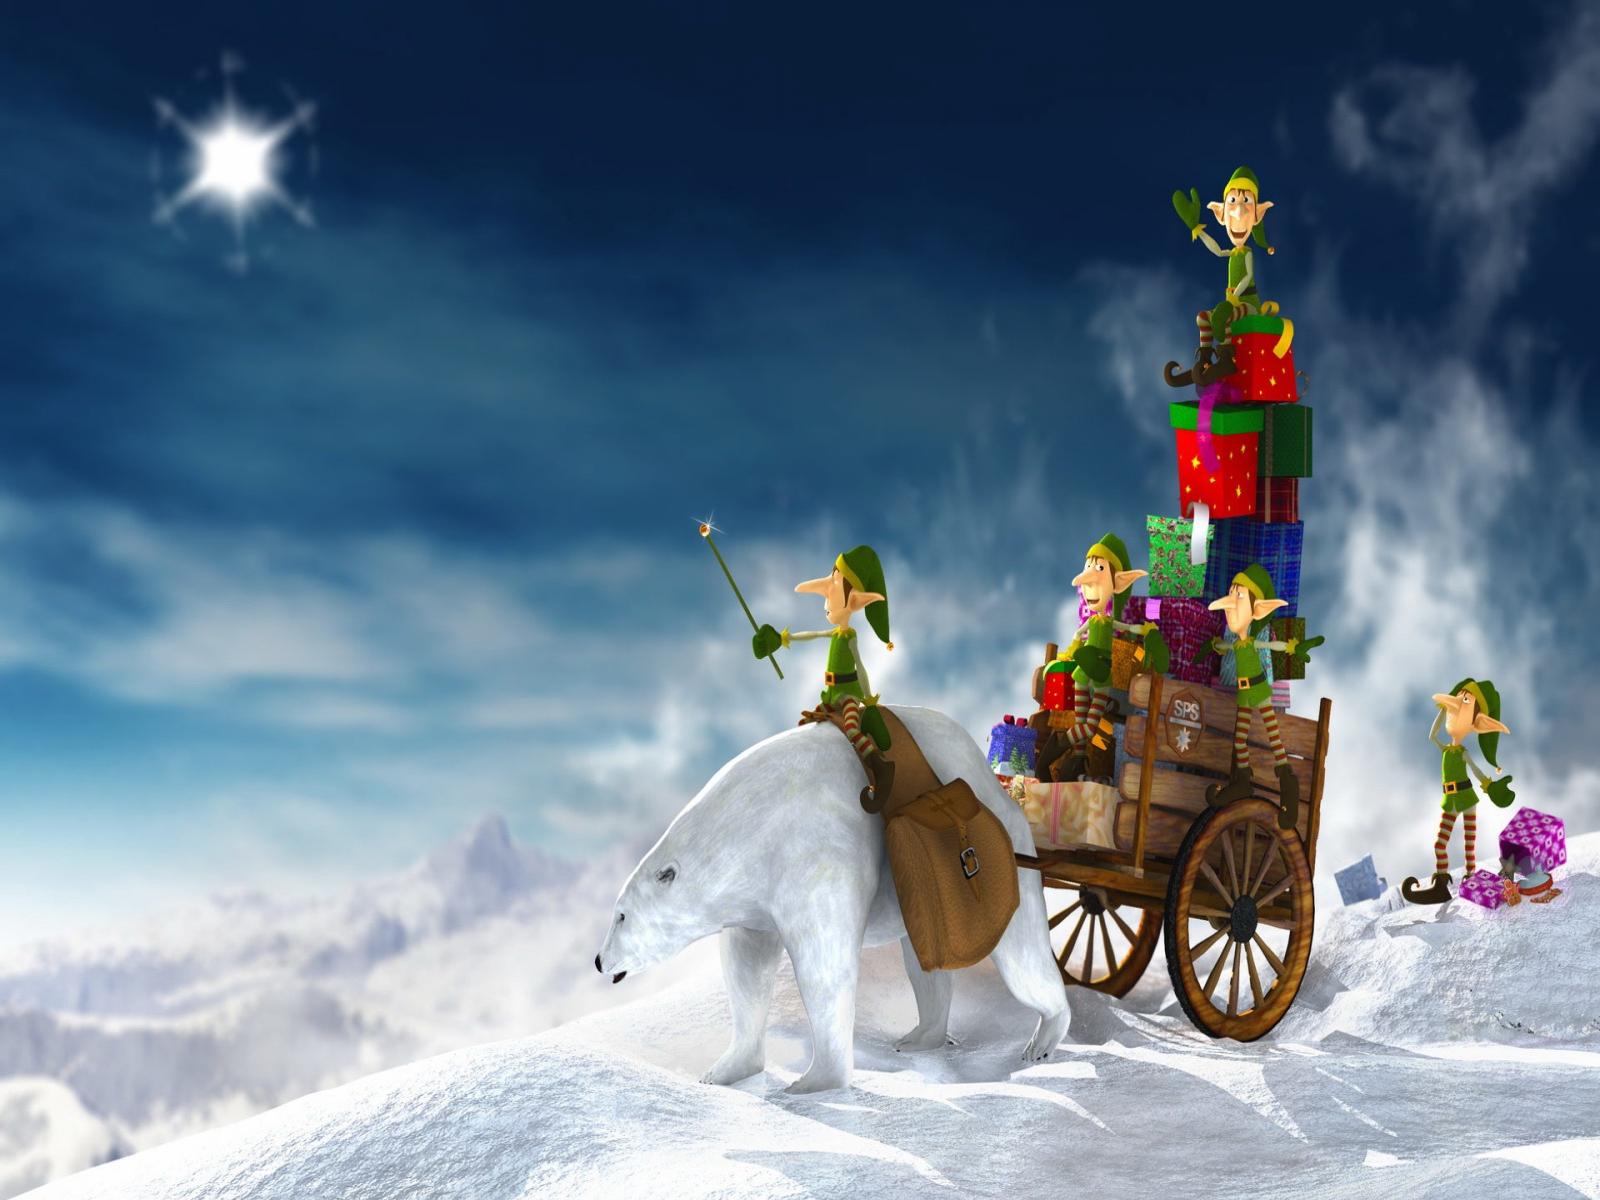 Christmas Snow Desktop Wallpaper 1600x1200